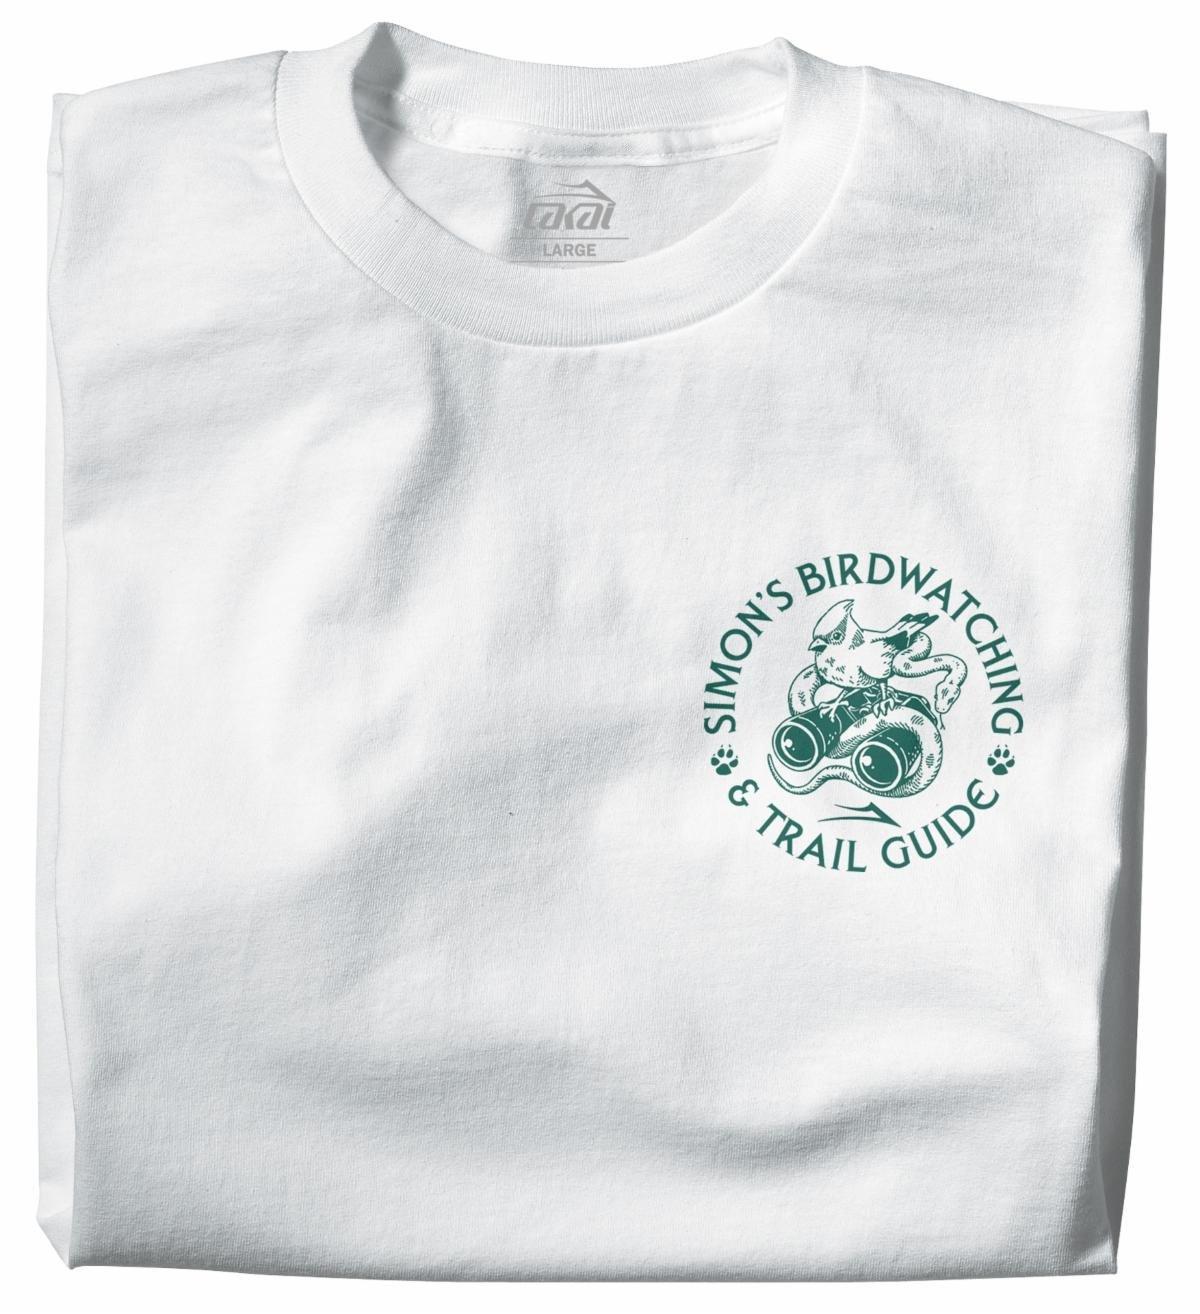 Lakai Simon's Birdwatching s/s t shirt white/green